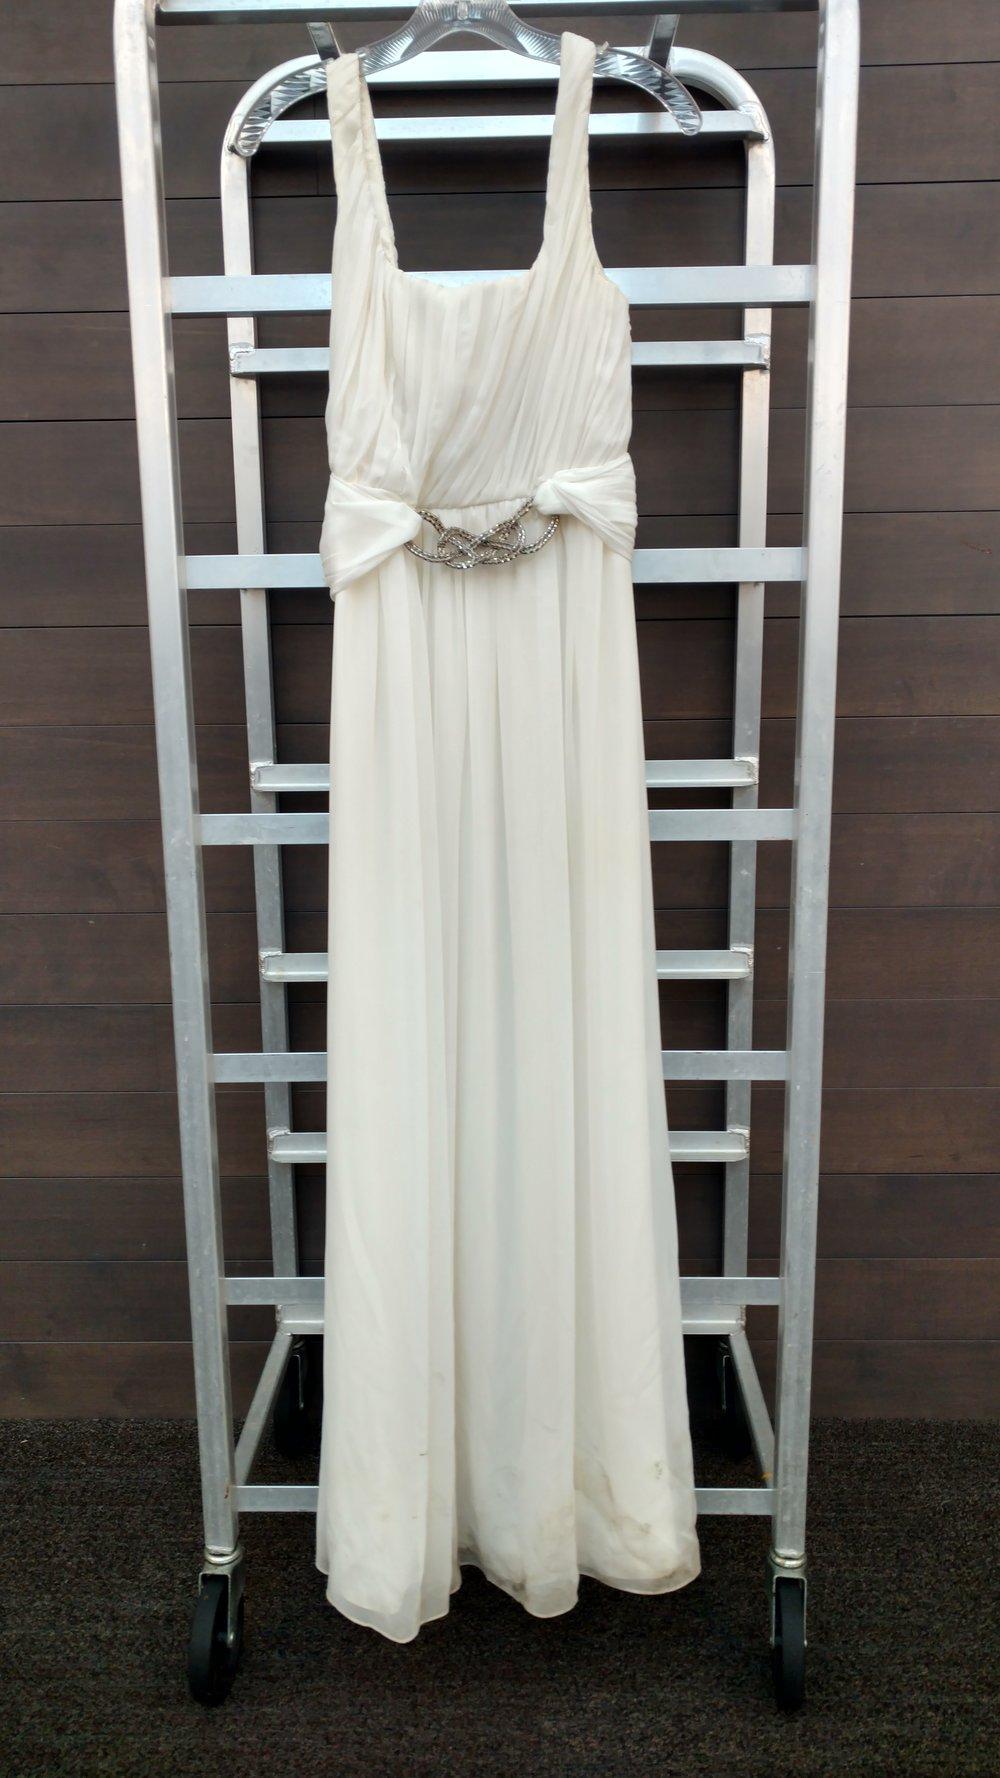 Dress 6 -Jill Stuart, Size, 6 White, Waist 26 inches, length, 53 inches,